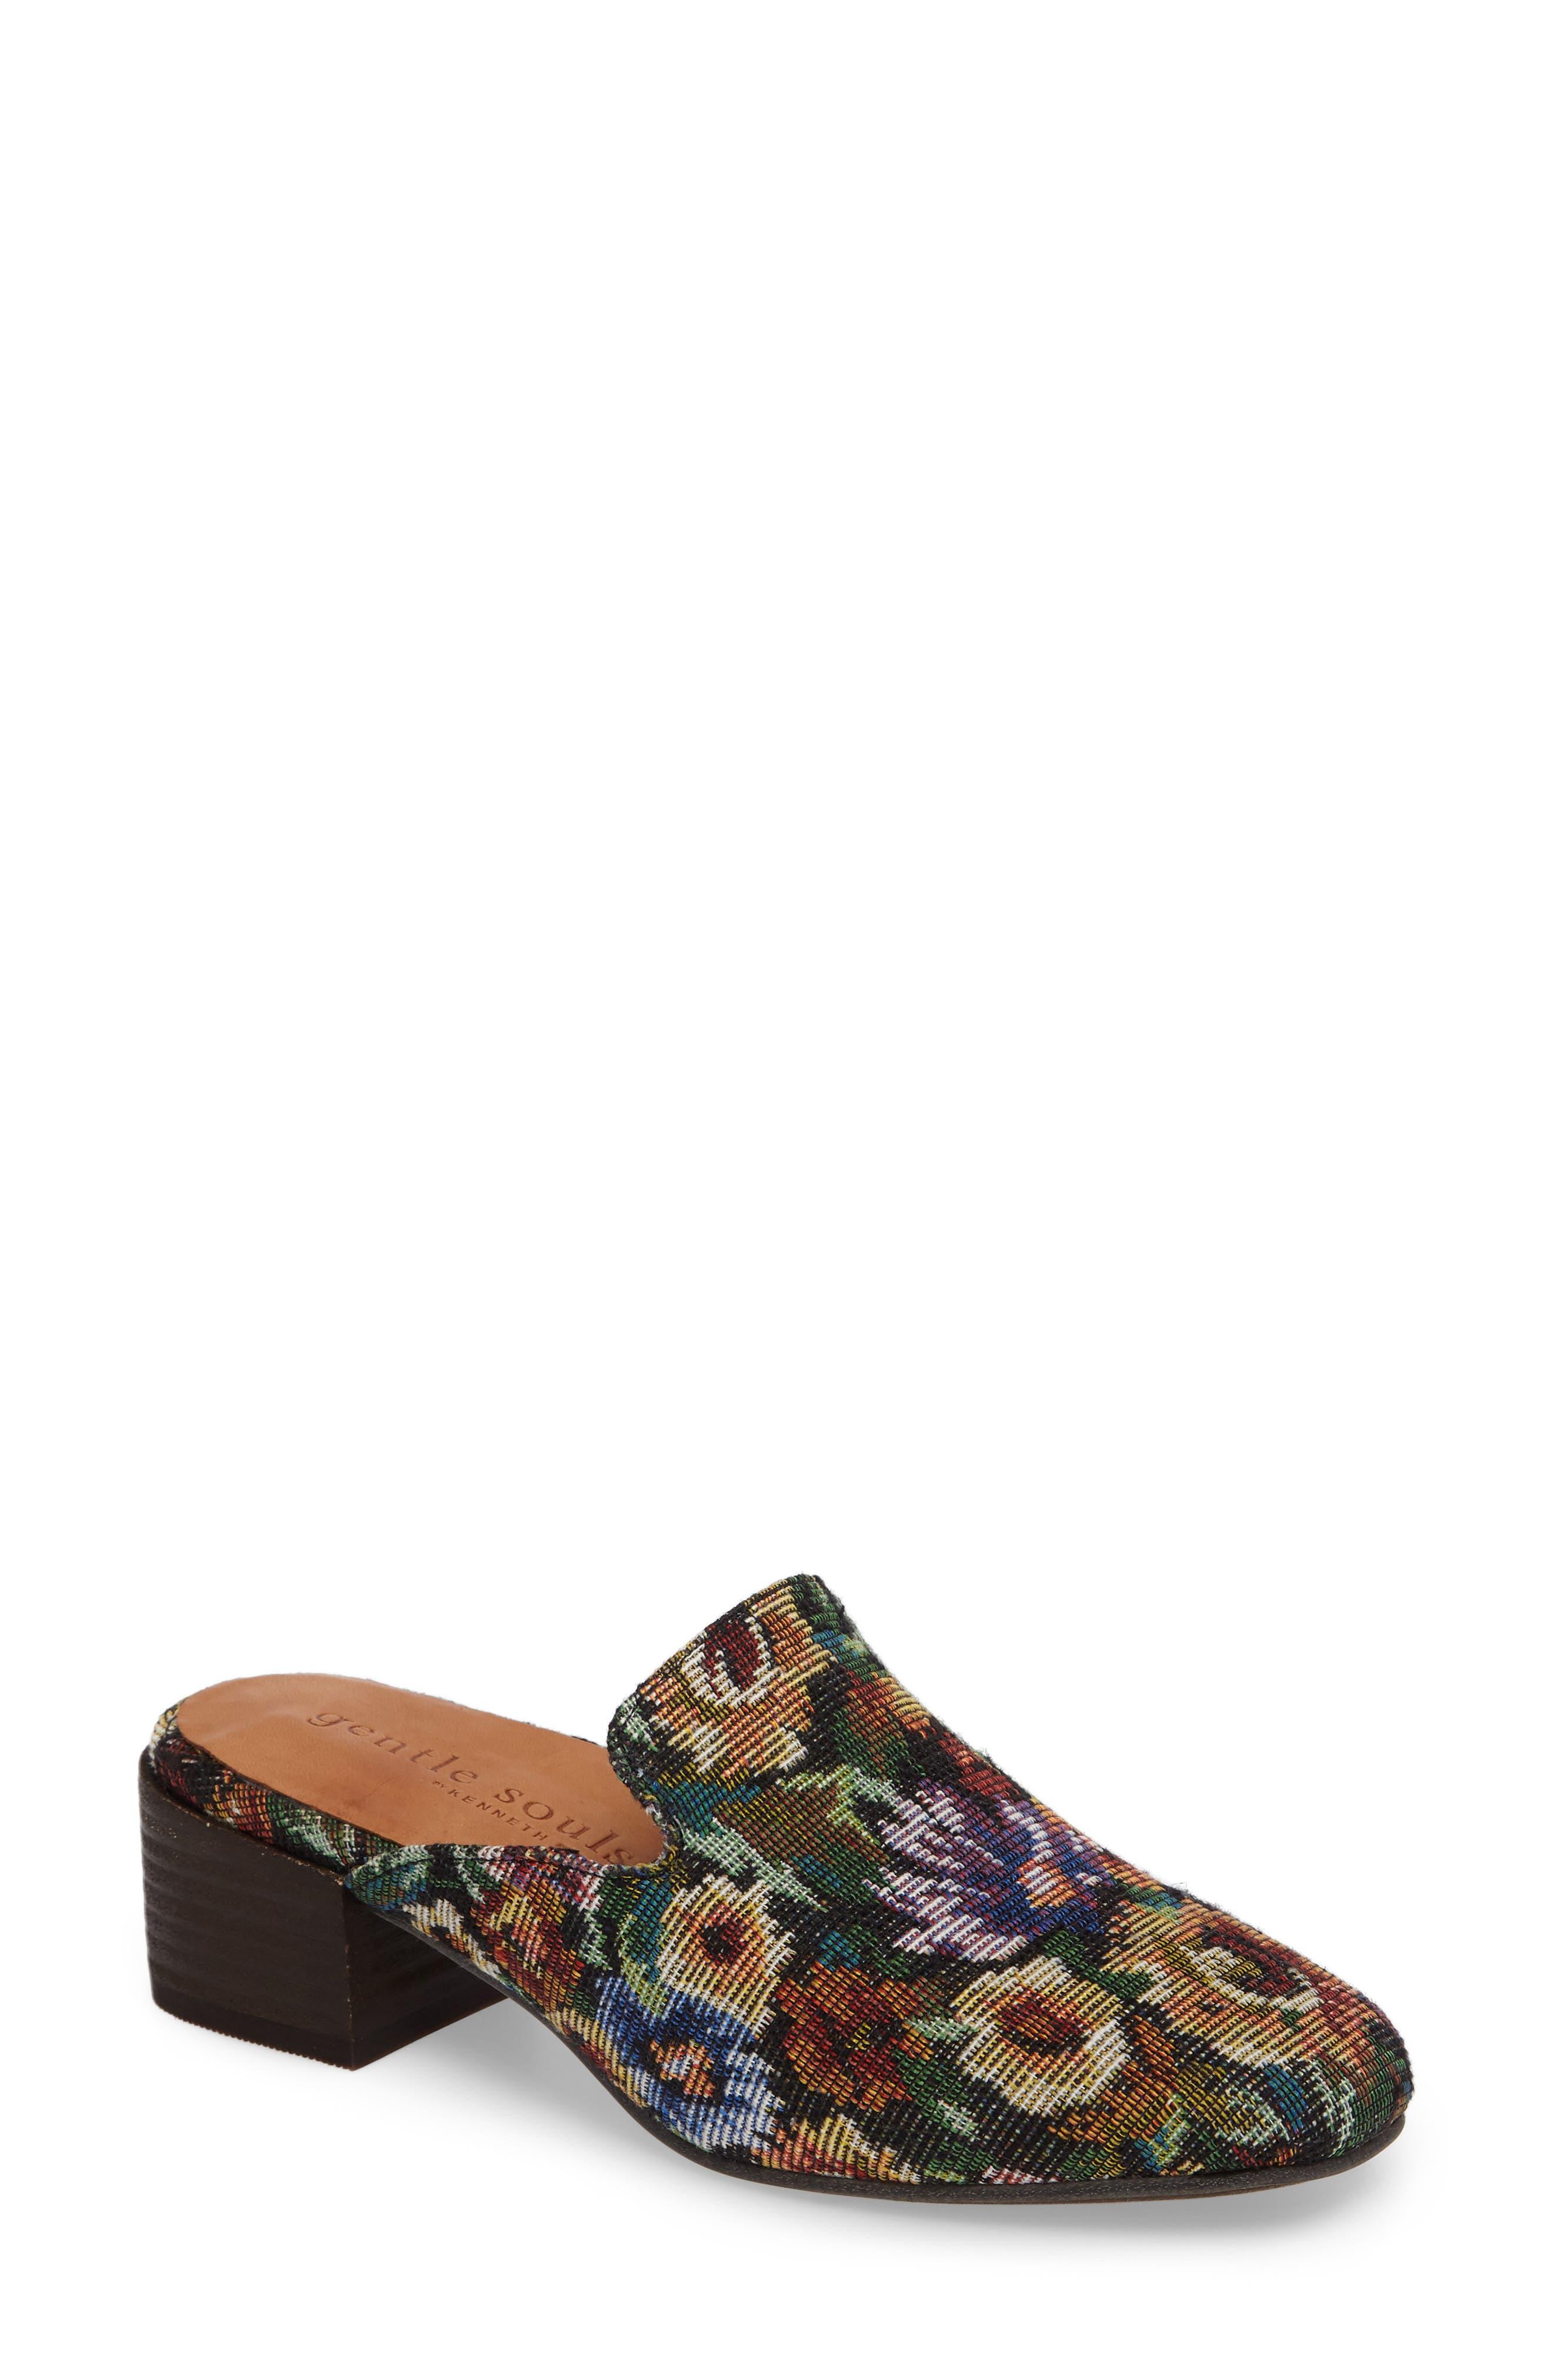 Eida Loafer Mule,                             Main thumbnail 1, color,                             Floral Fabric